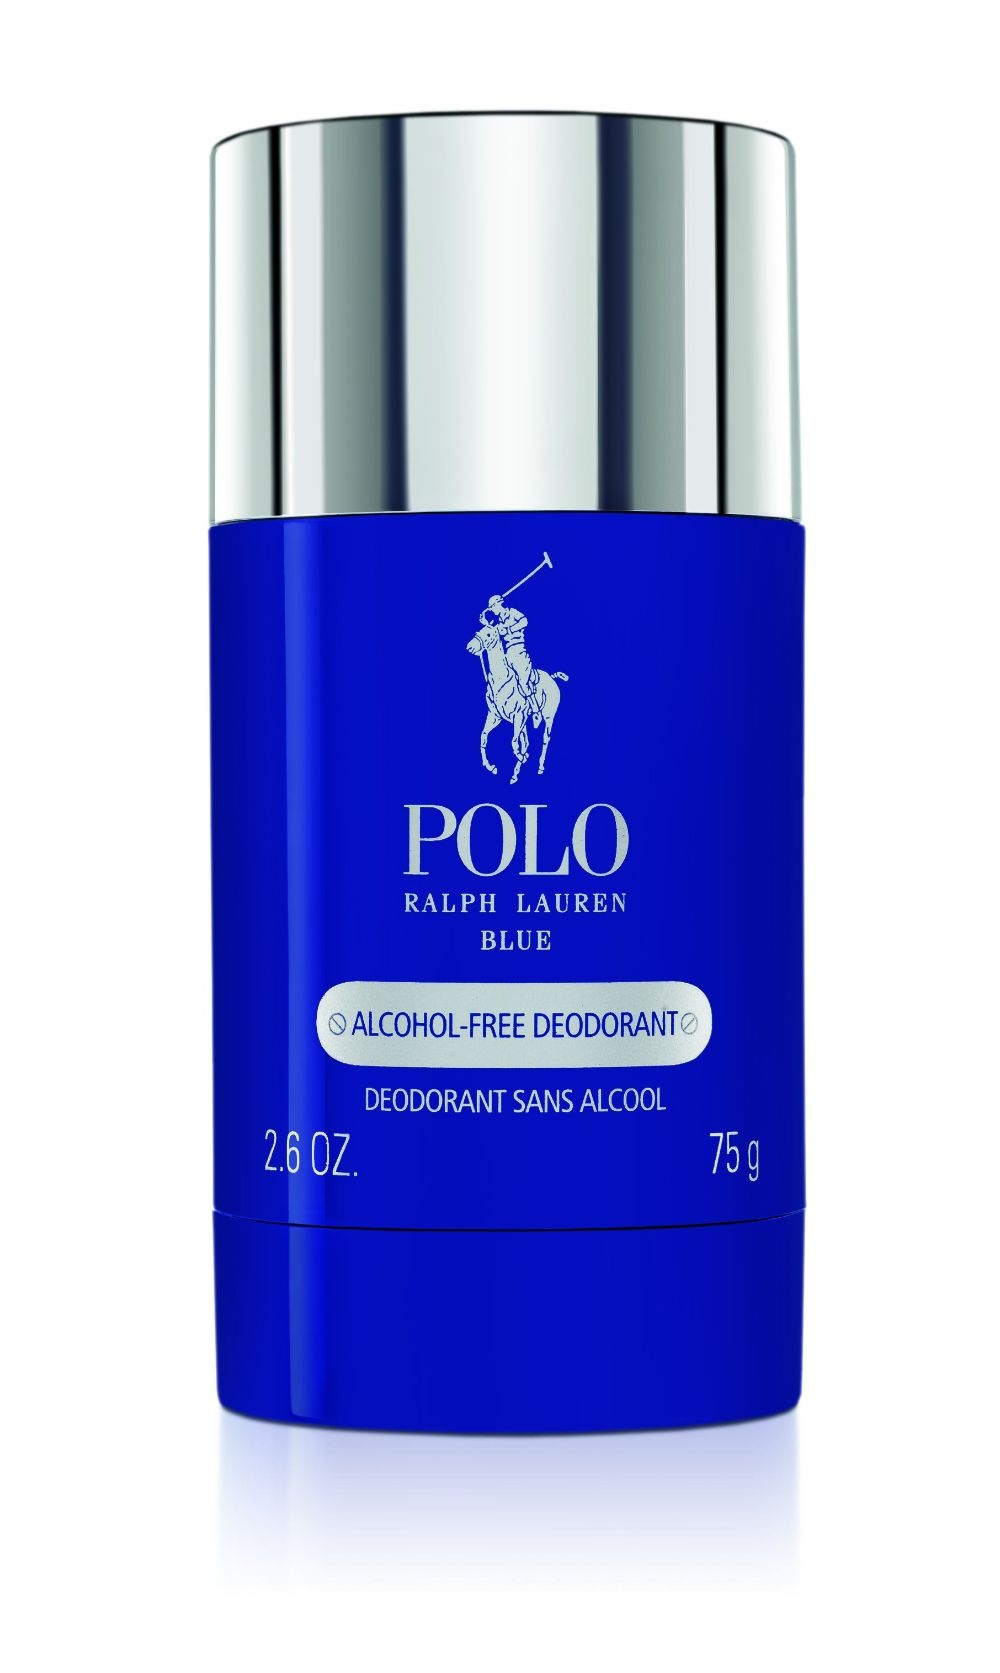 Ralph Lauren Polo Blue EDP Deodorant Stick, 75g